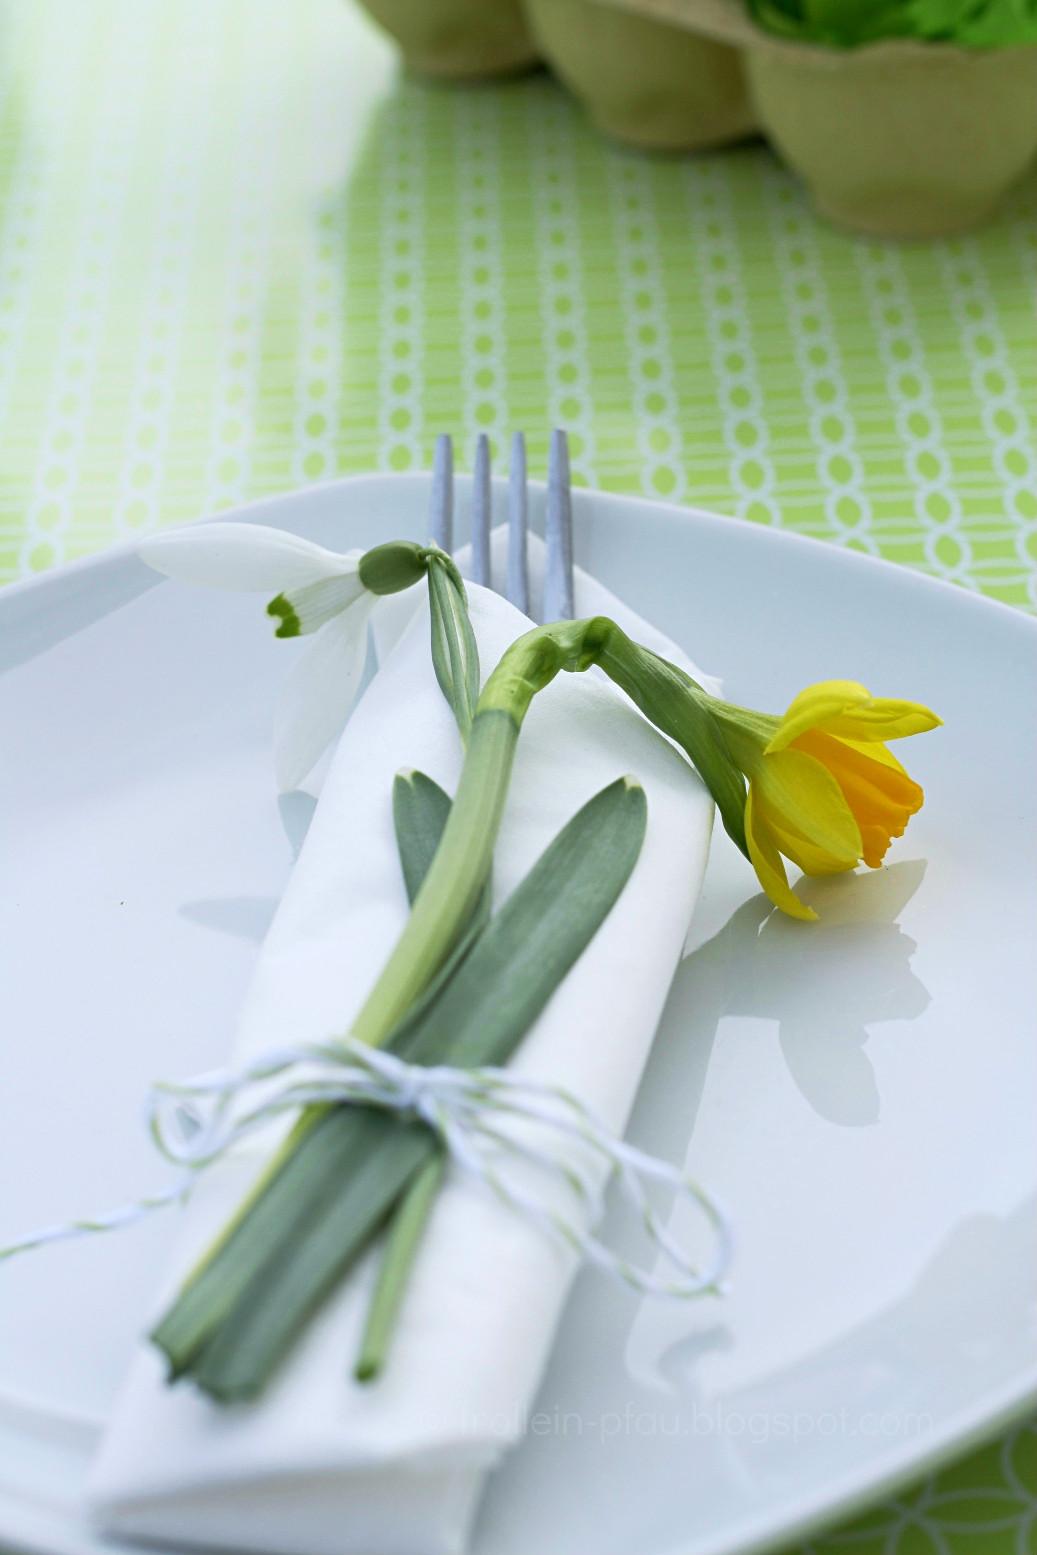 Ostern, DIY Osterdeko, Ostergesteck, Upcycling, Basteln, Eierkarton, Blumen, Blumengesteck, Frühblüher, Kaffeetafel, Frühlingsidee, Frühlingsdeko, Creadienstag, Frollein Pfau